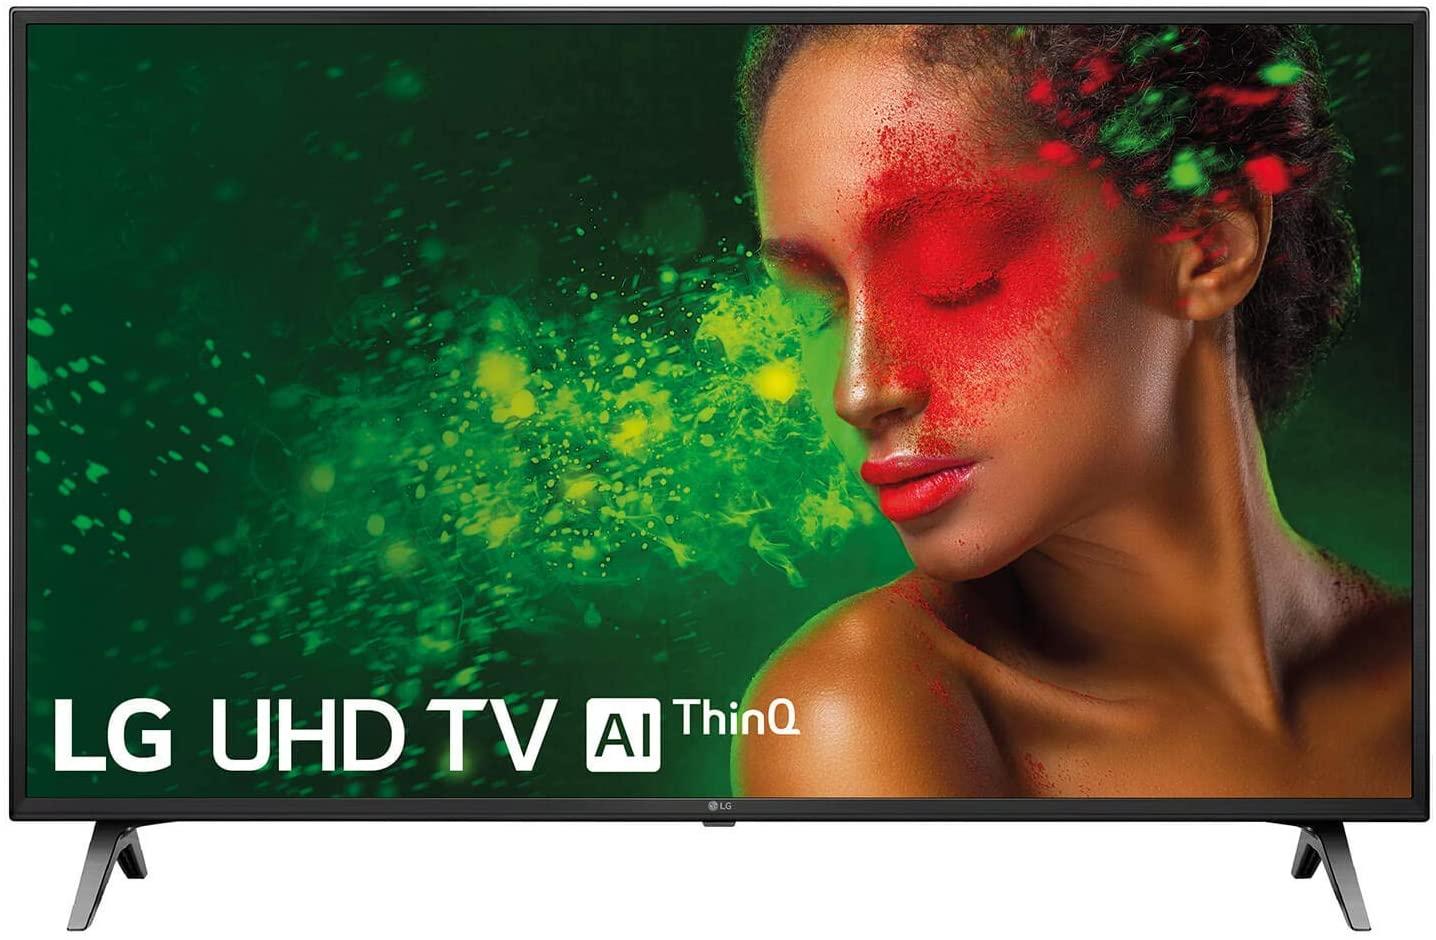 "LG 49UM7100ALEXA - Smart TV 4K UHD de 124 cm (49"") Works With Alexa (procesador Quad Core, HDR y Sonido Ultra Surround) color negro [Clase de eficiencia energética A]"